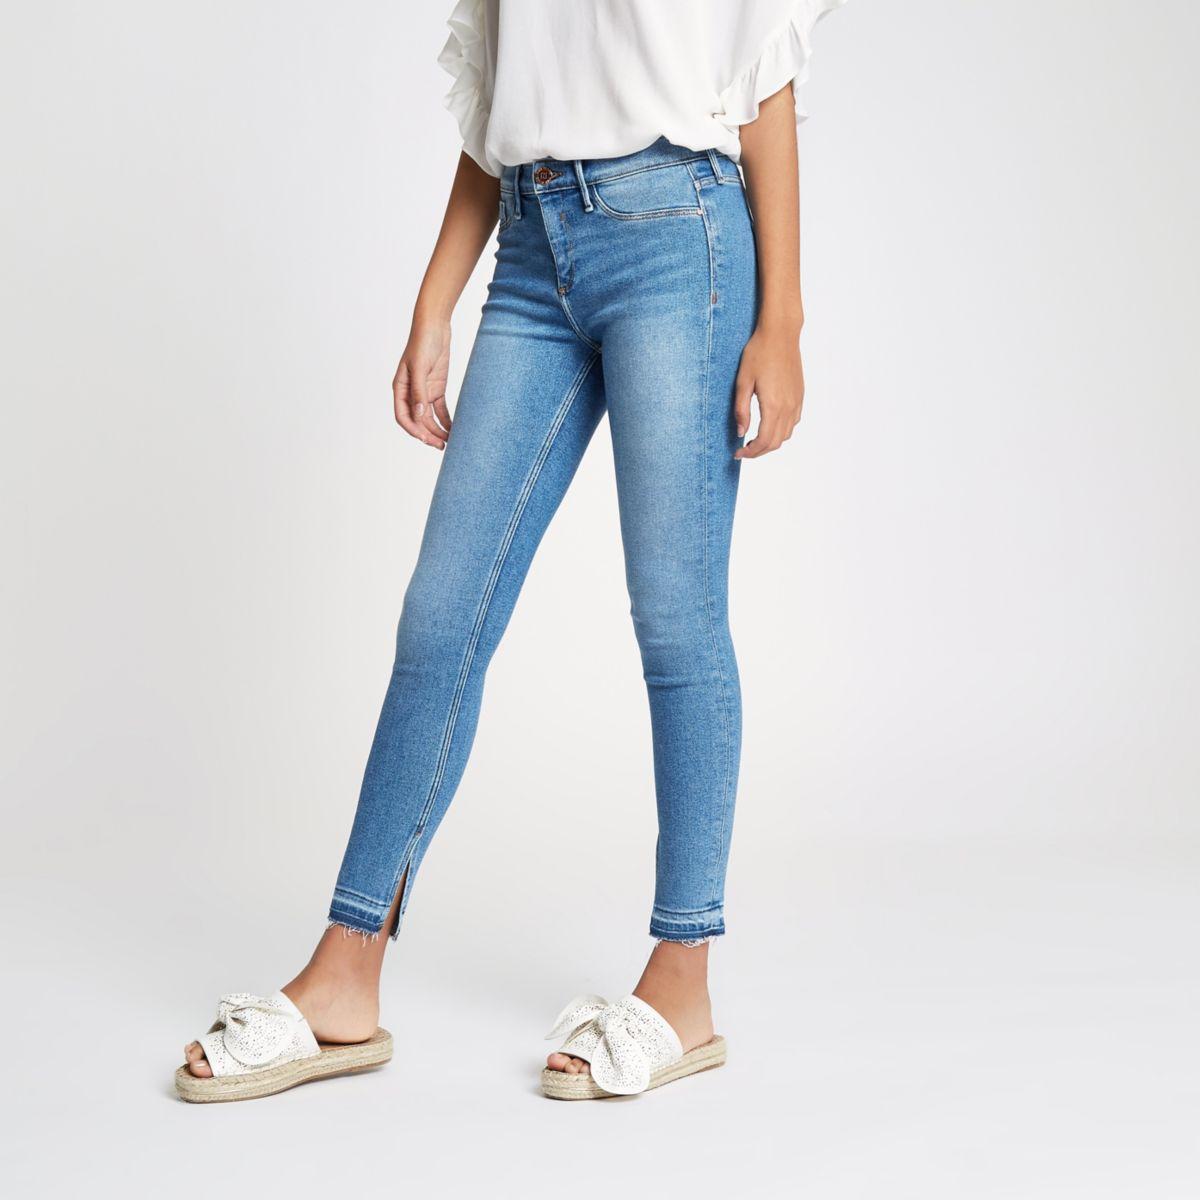 Molly - Middenblauwe jeans met hoge taille en split in de zoom